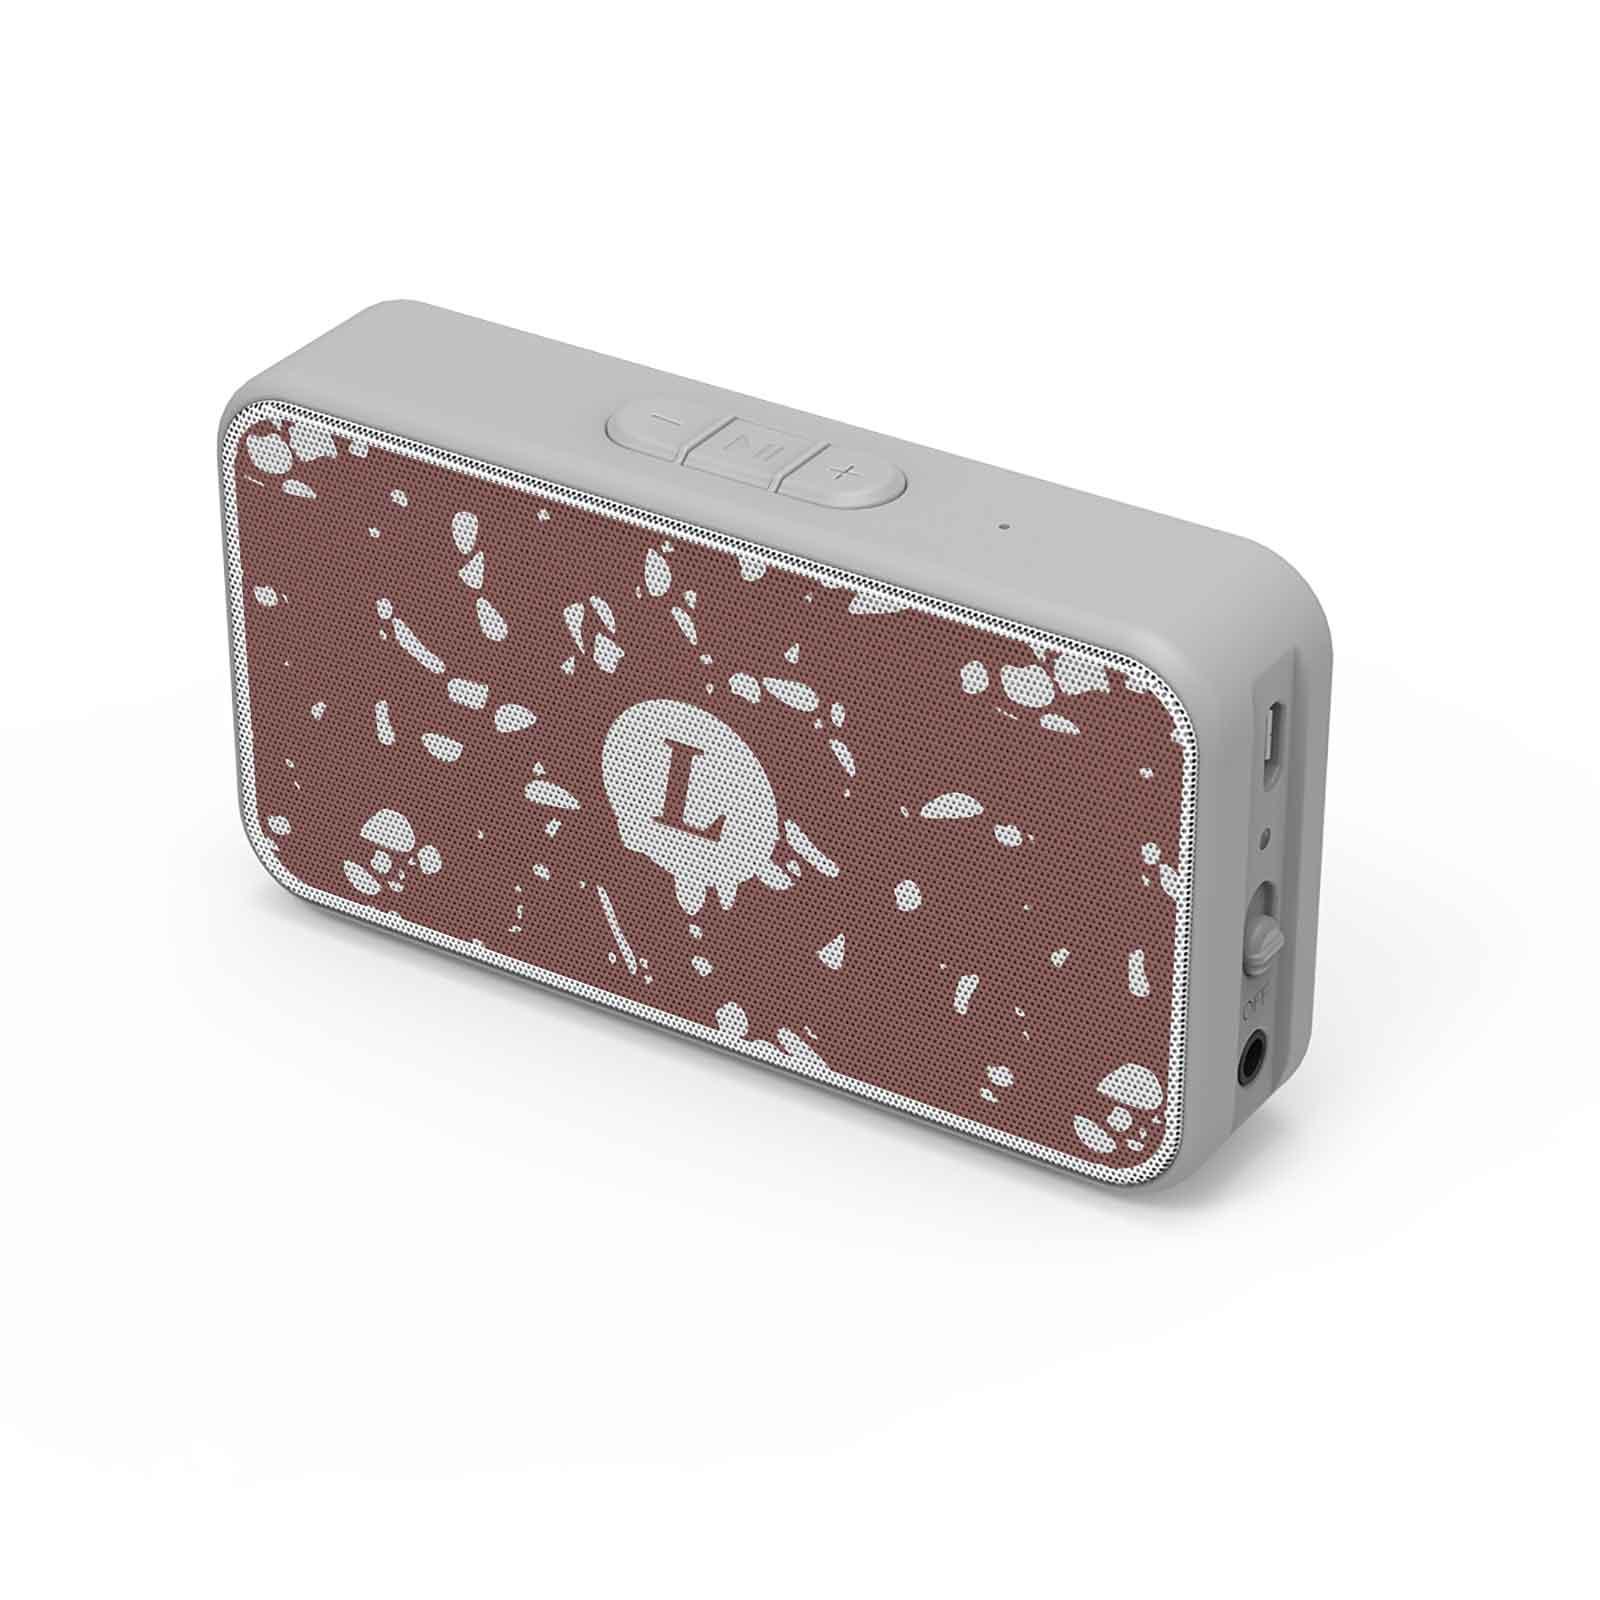 165440 mini aria speaker custom packaging full color grill